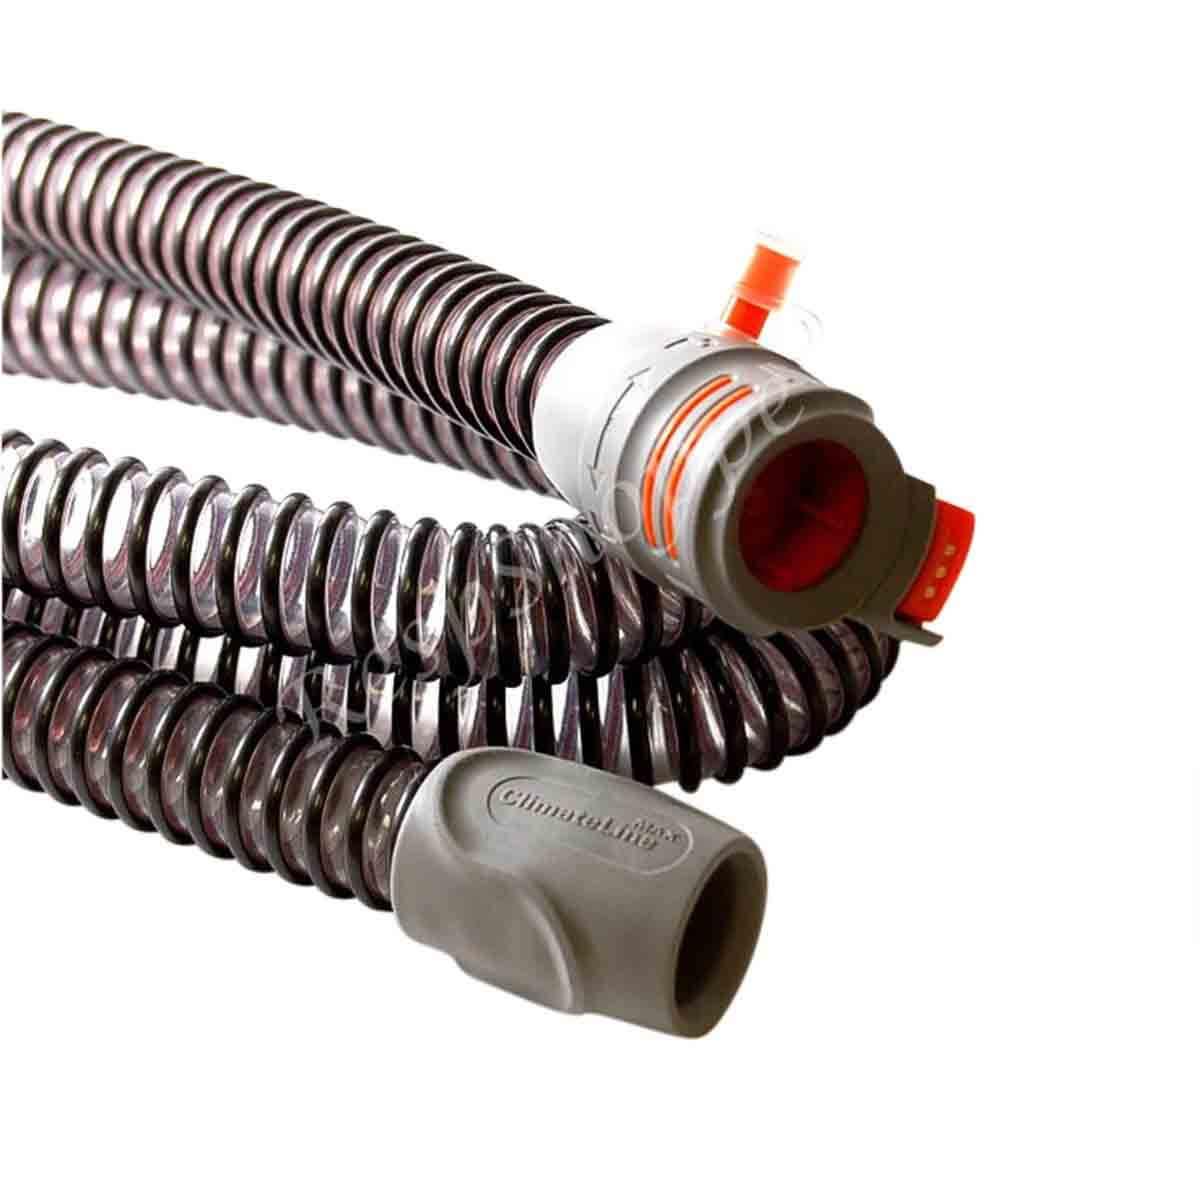 tubing for oxygen machine